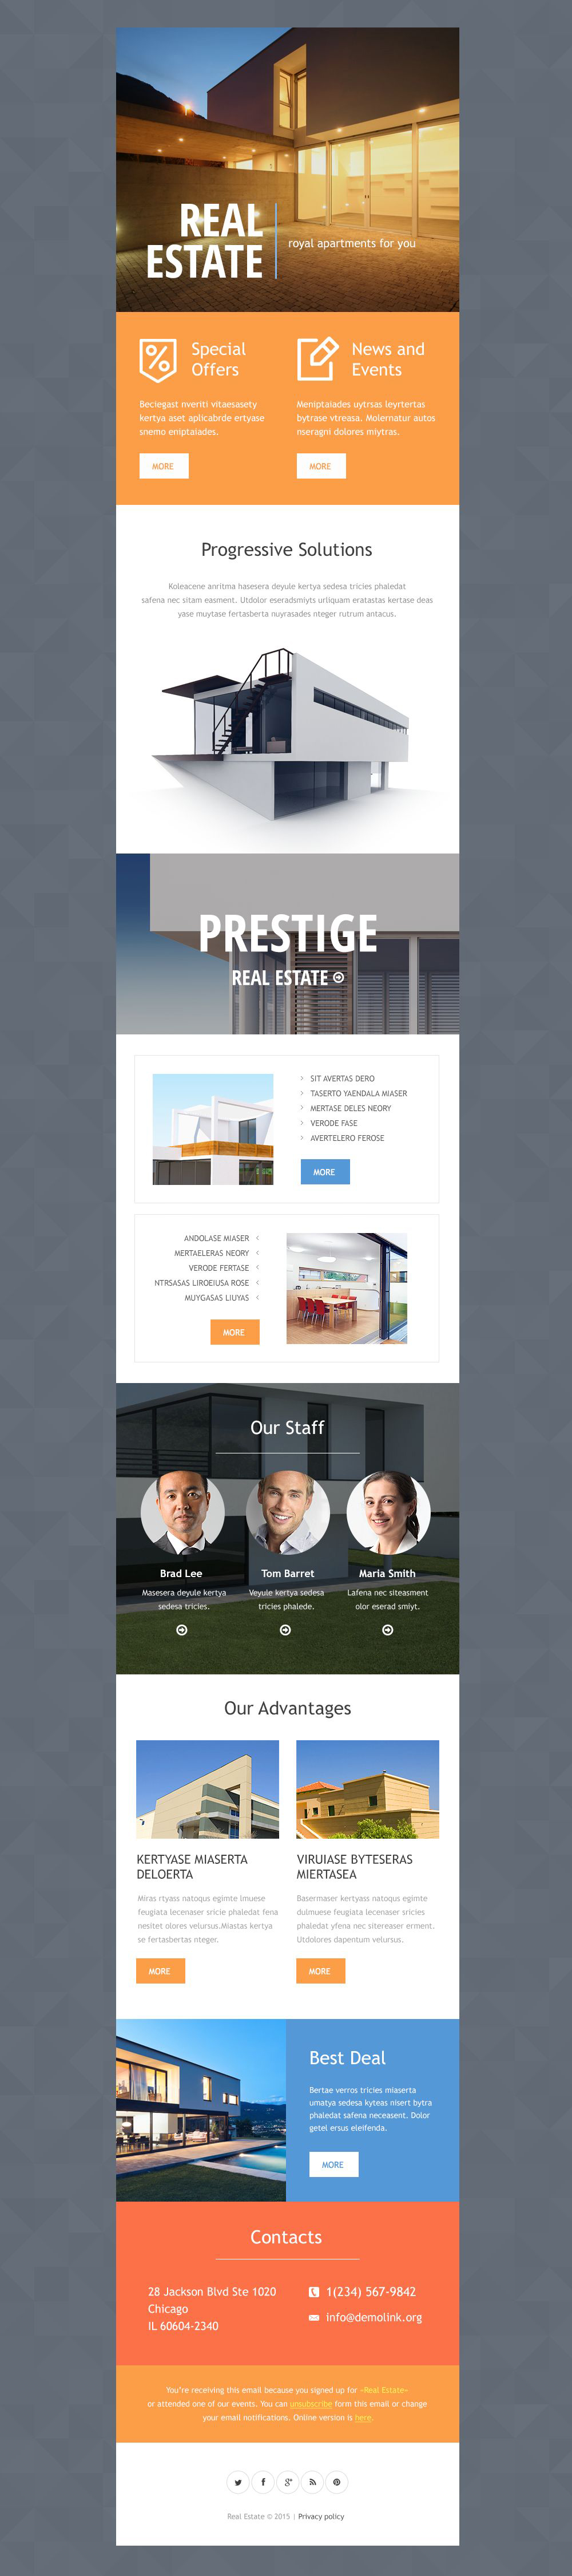 Plantilla De Boletín De Noticias Responsive para Sitio de Agencias inmobiliarias #53671 - captura de pantalla